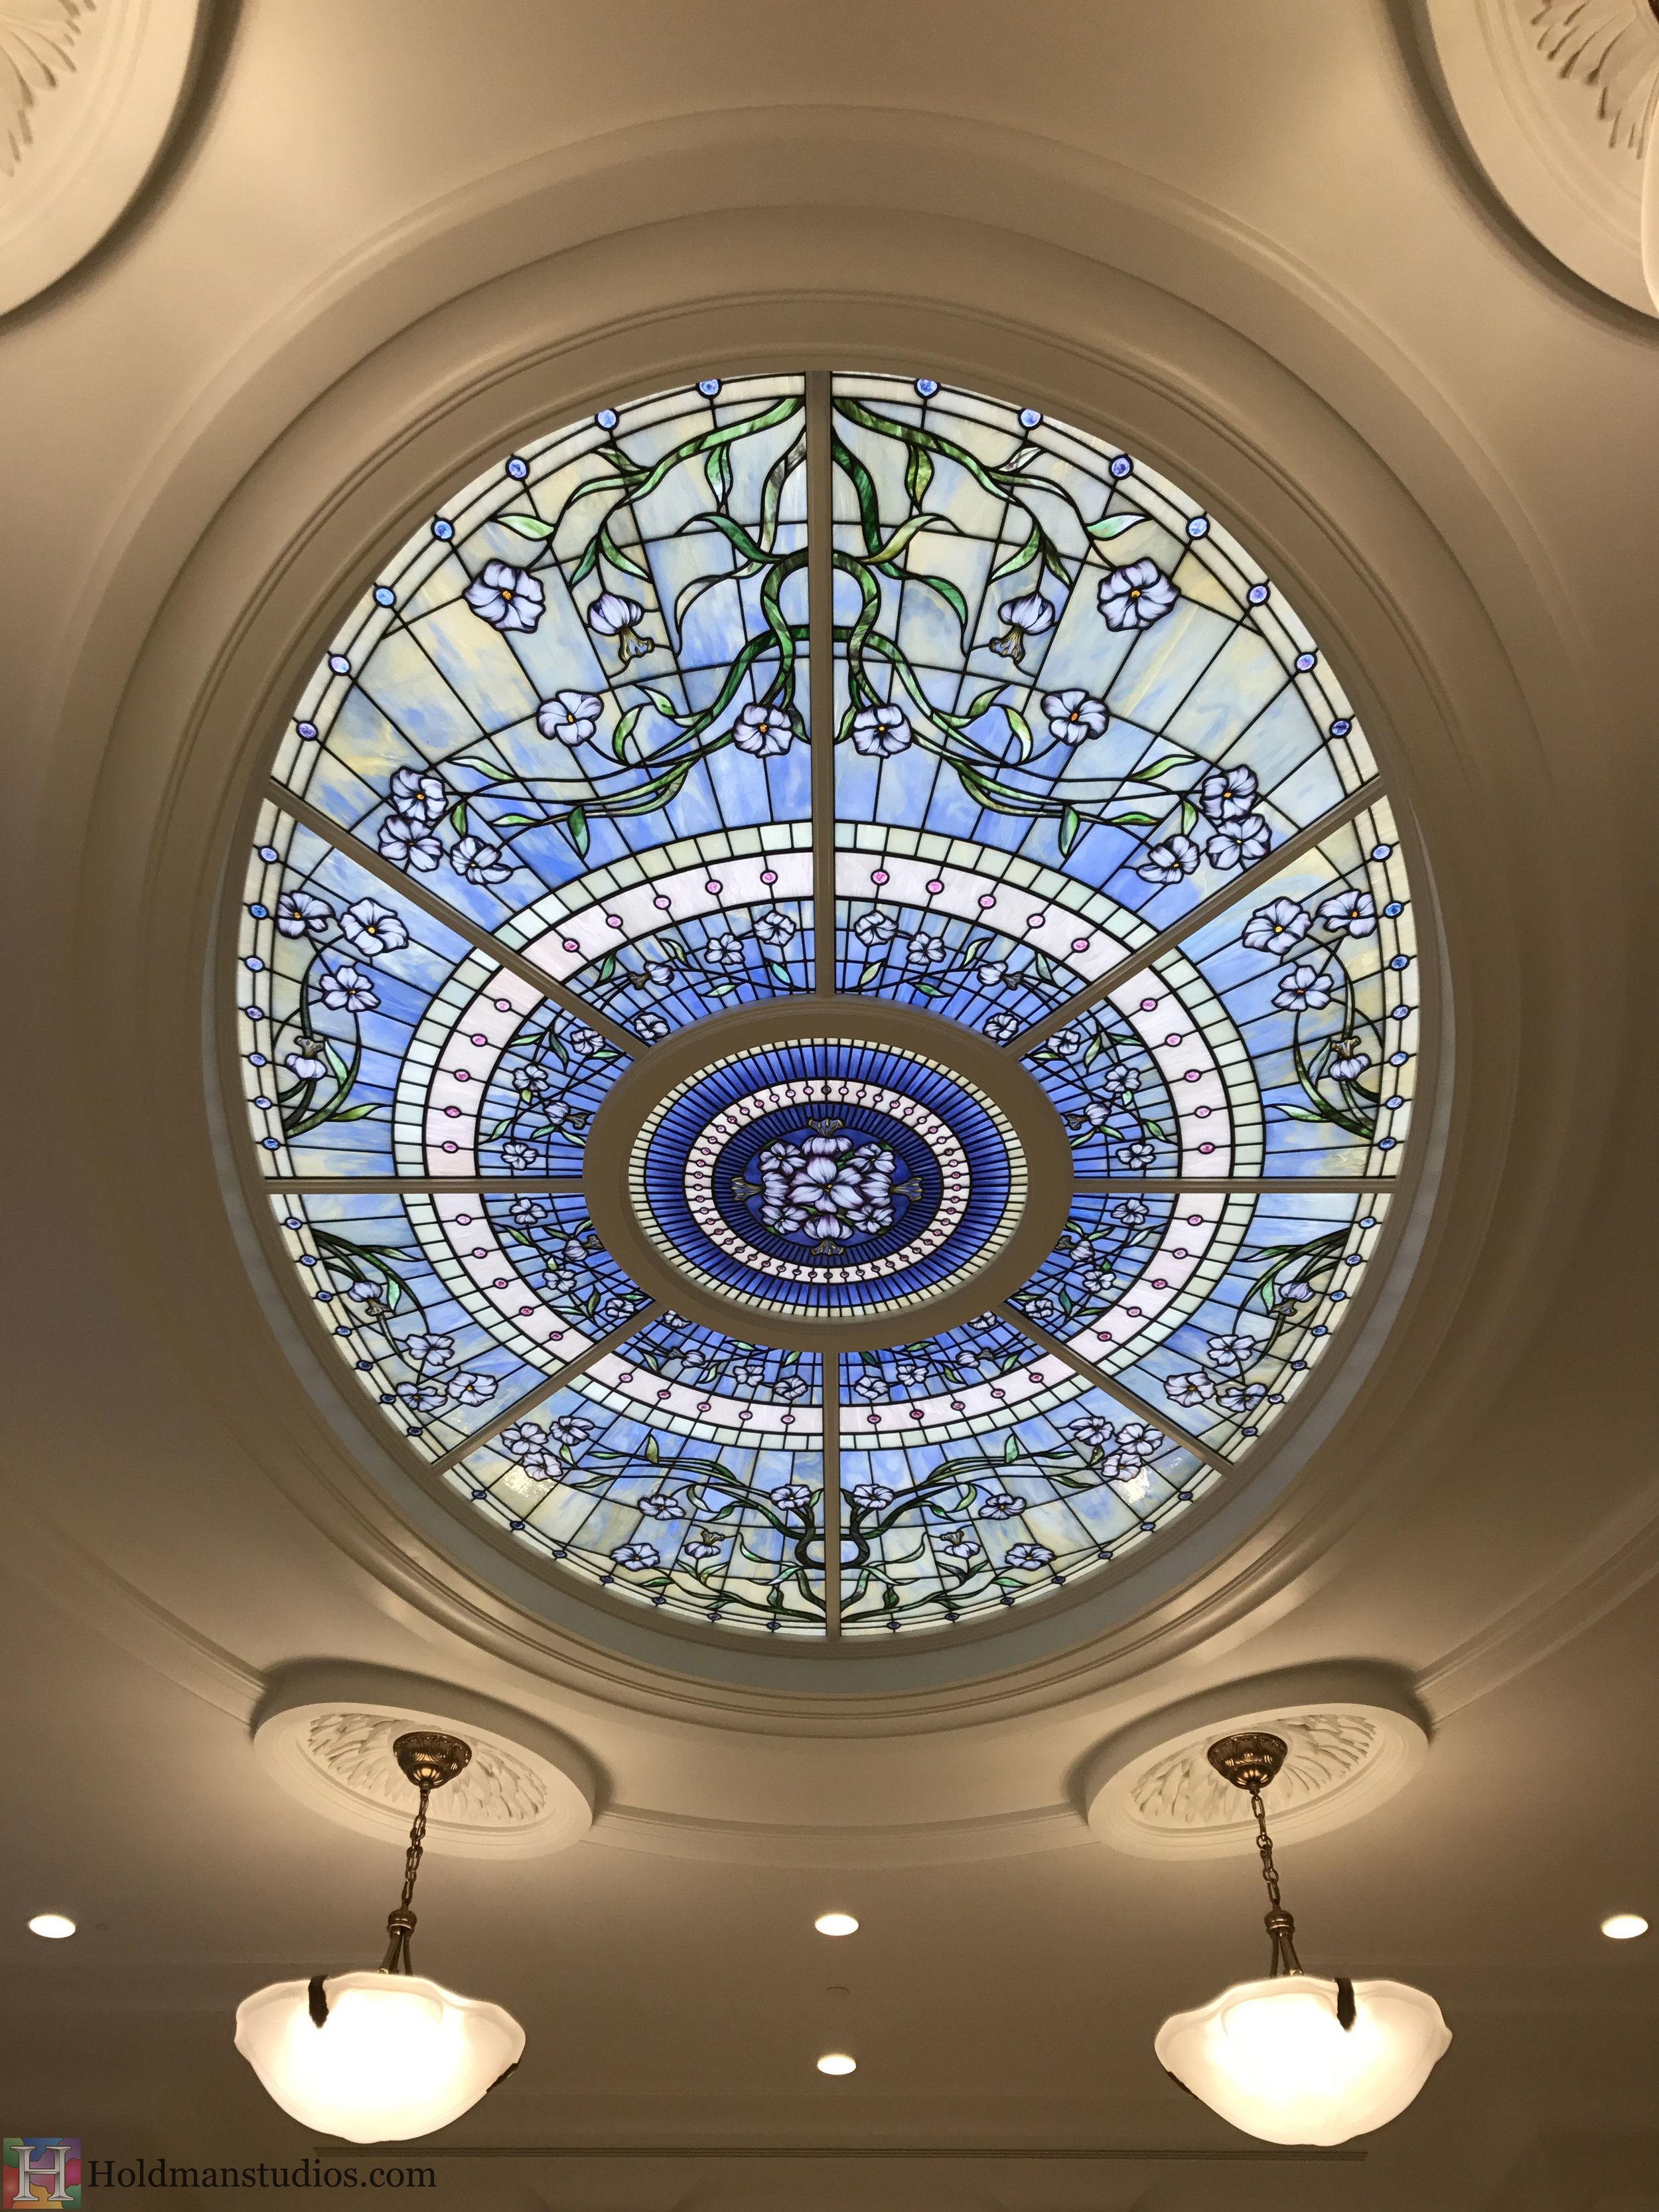 Holdman-Studios-Stained-Glass-Paris-LDS-Temple-Martagon-Flowers-Leaves-Sun-Moon-Stars-Skylight-Window.jpg